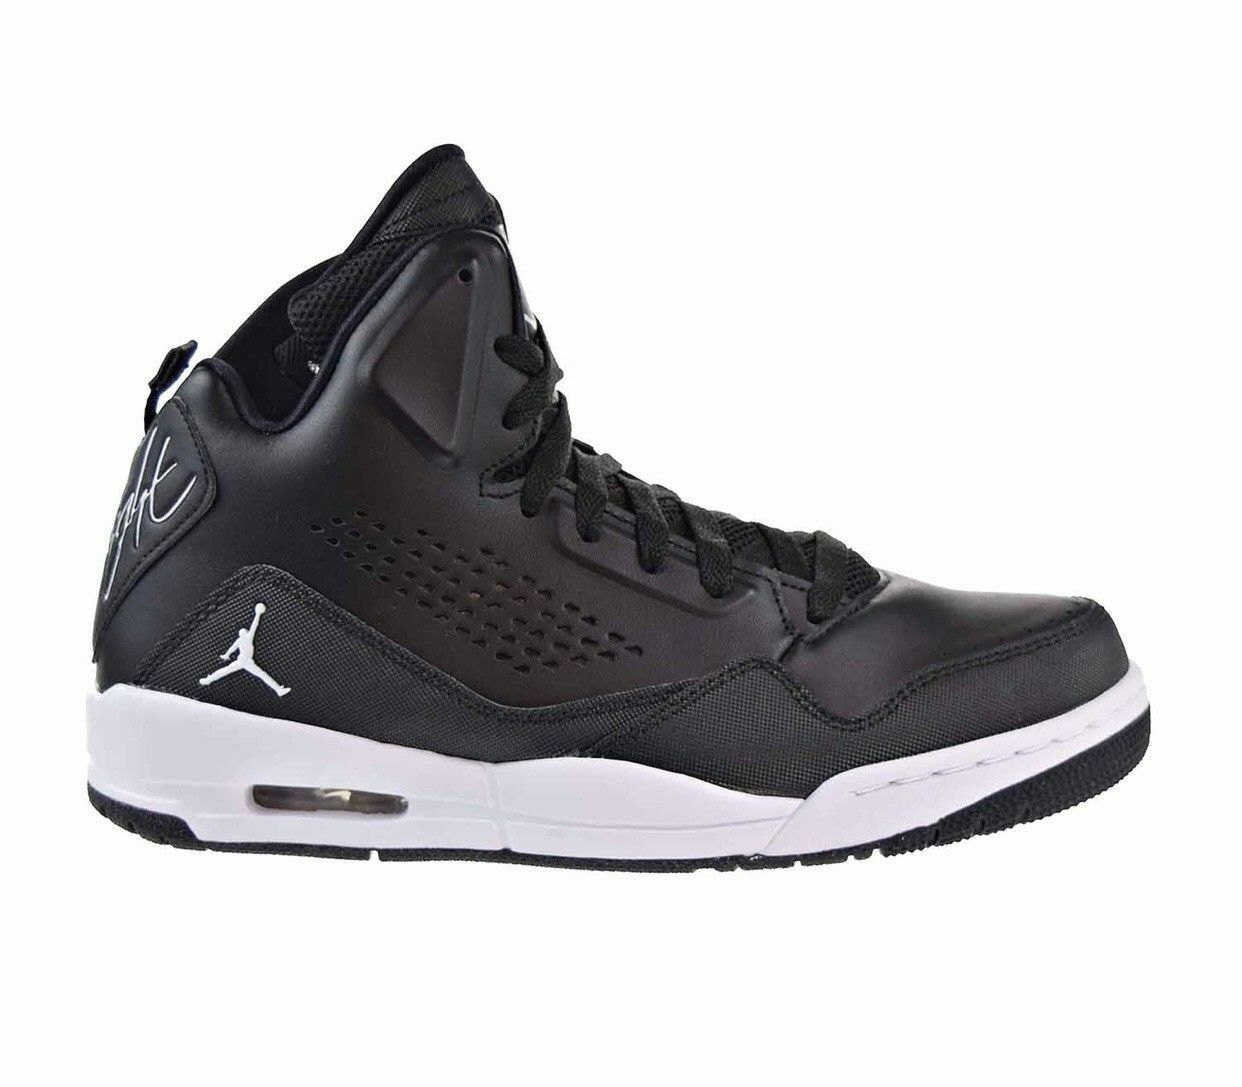 Nike Air Jordan SC-3 Black White 629877-008 Men's SZ 10 New With Box